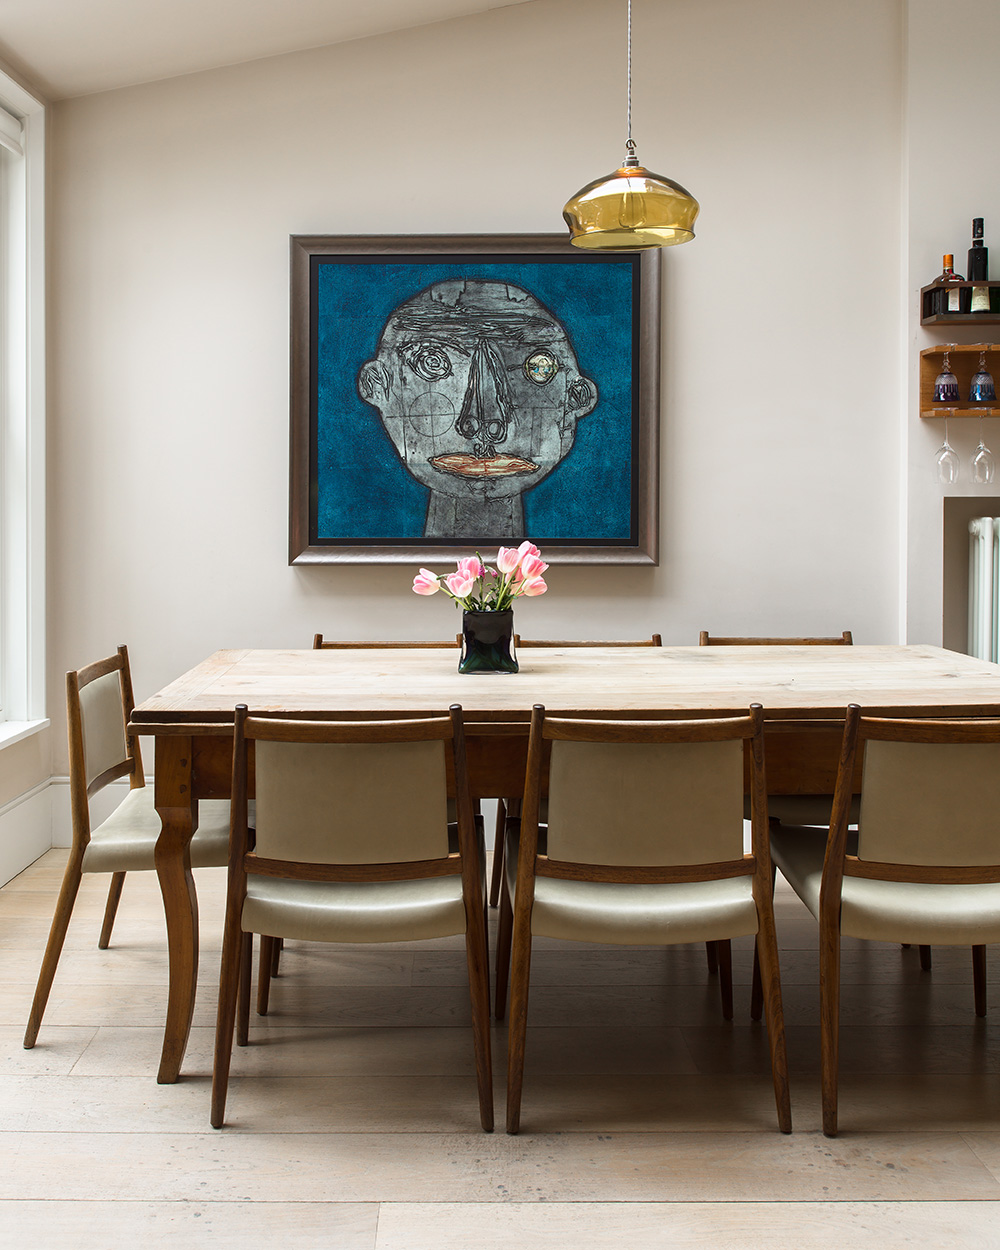 Dining area – interior design by Eadie & Crole